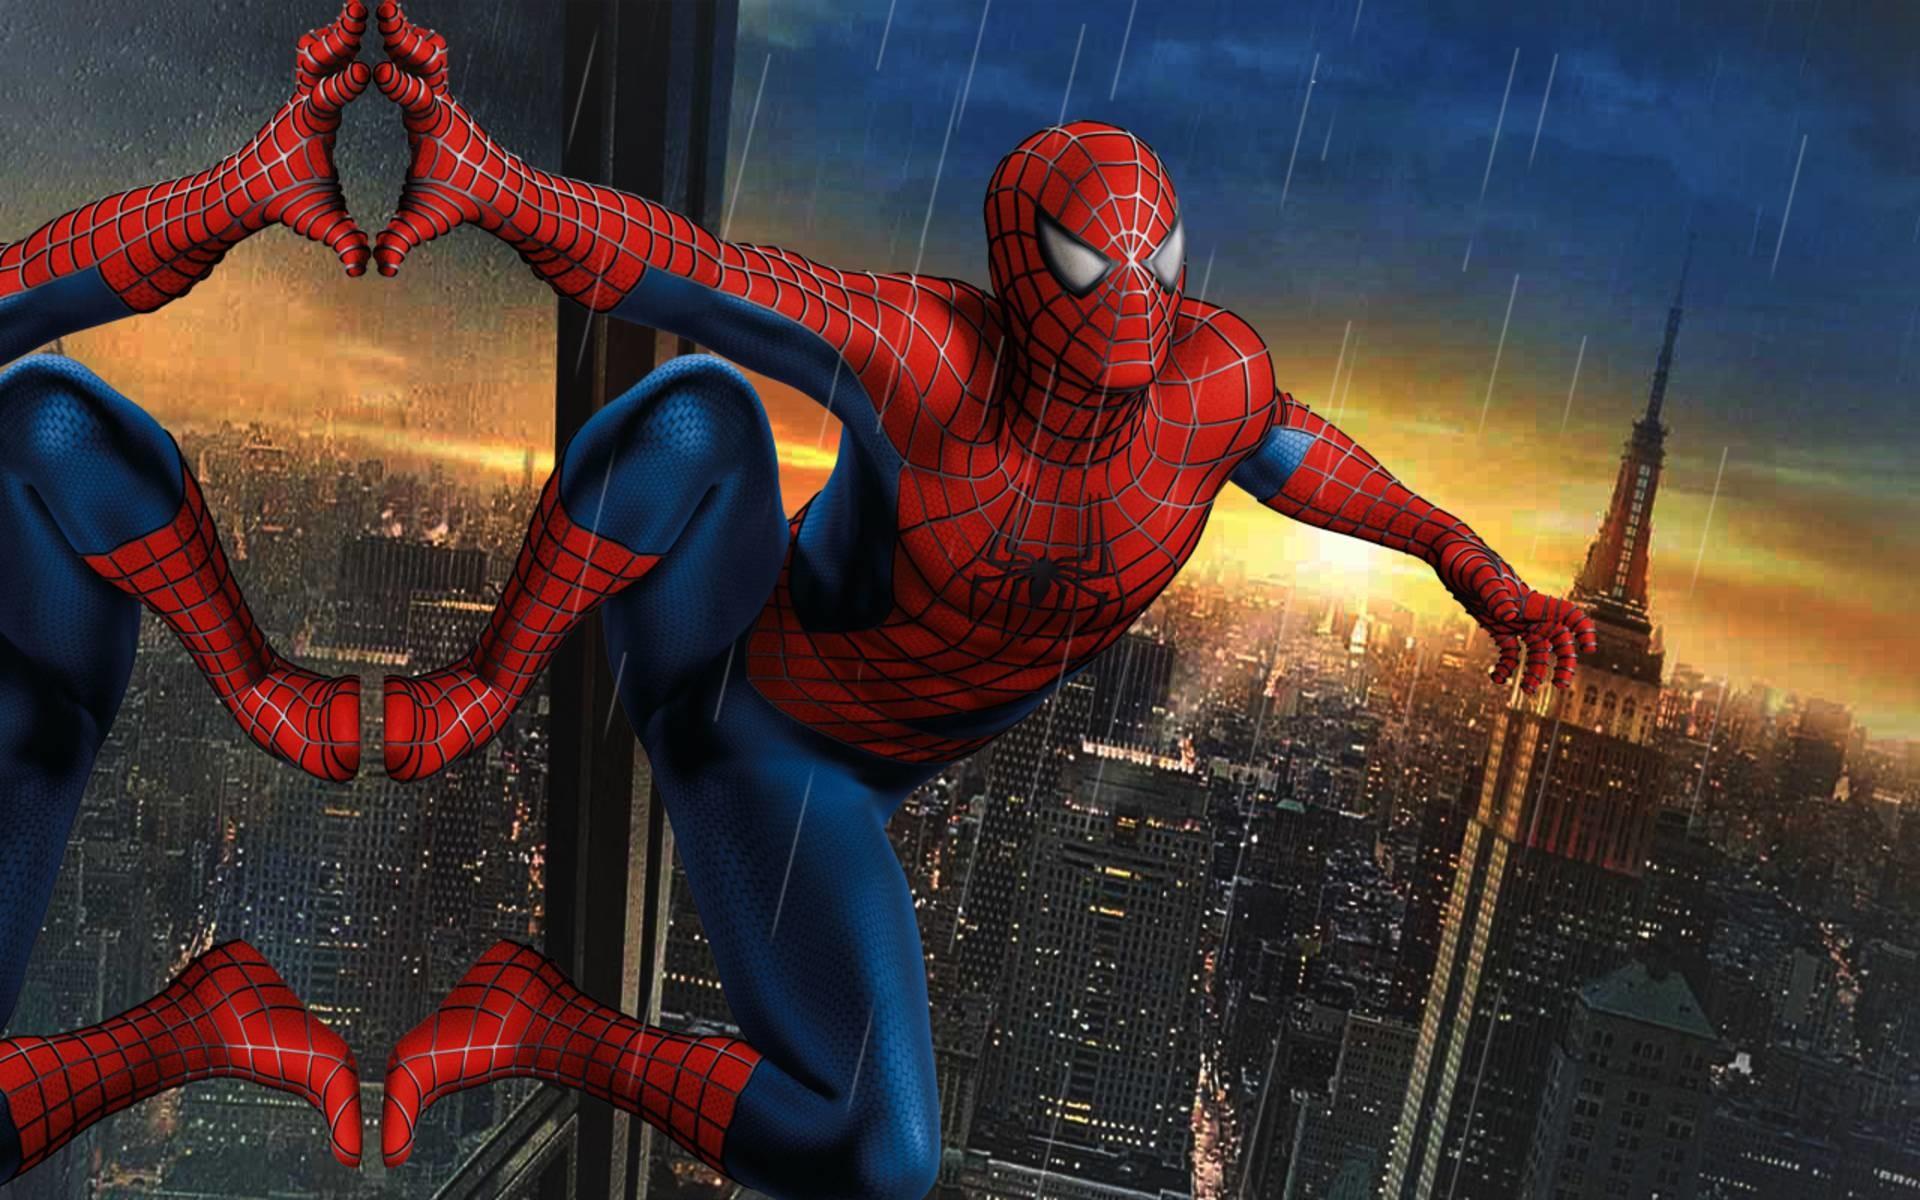 Games : Spiderman Wallpapers HD Wallpaper 1200x1920px Spiderman .